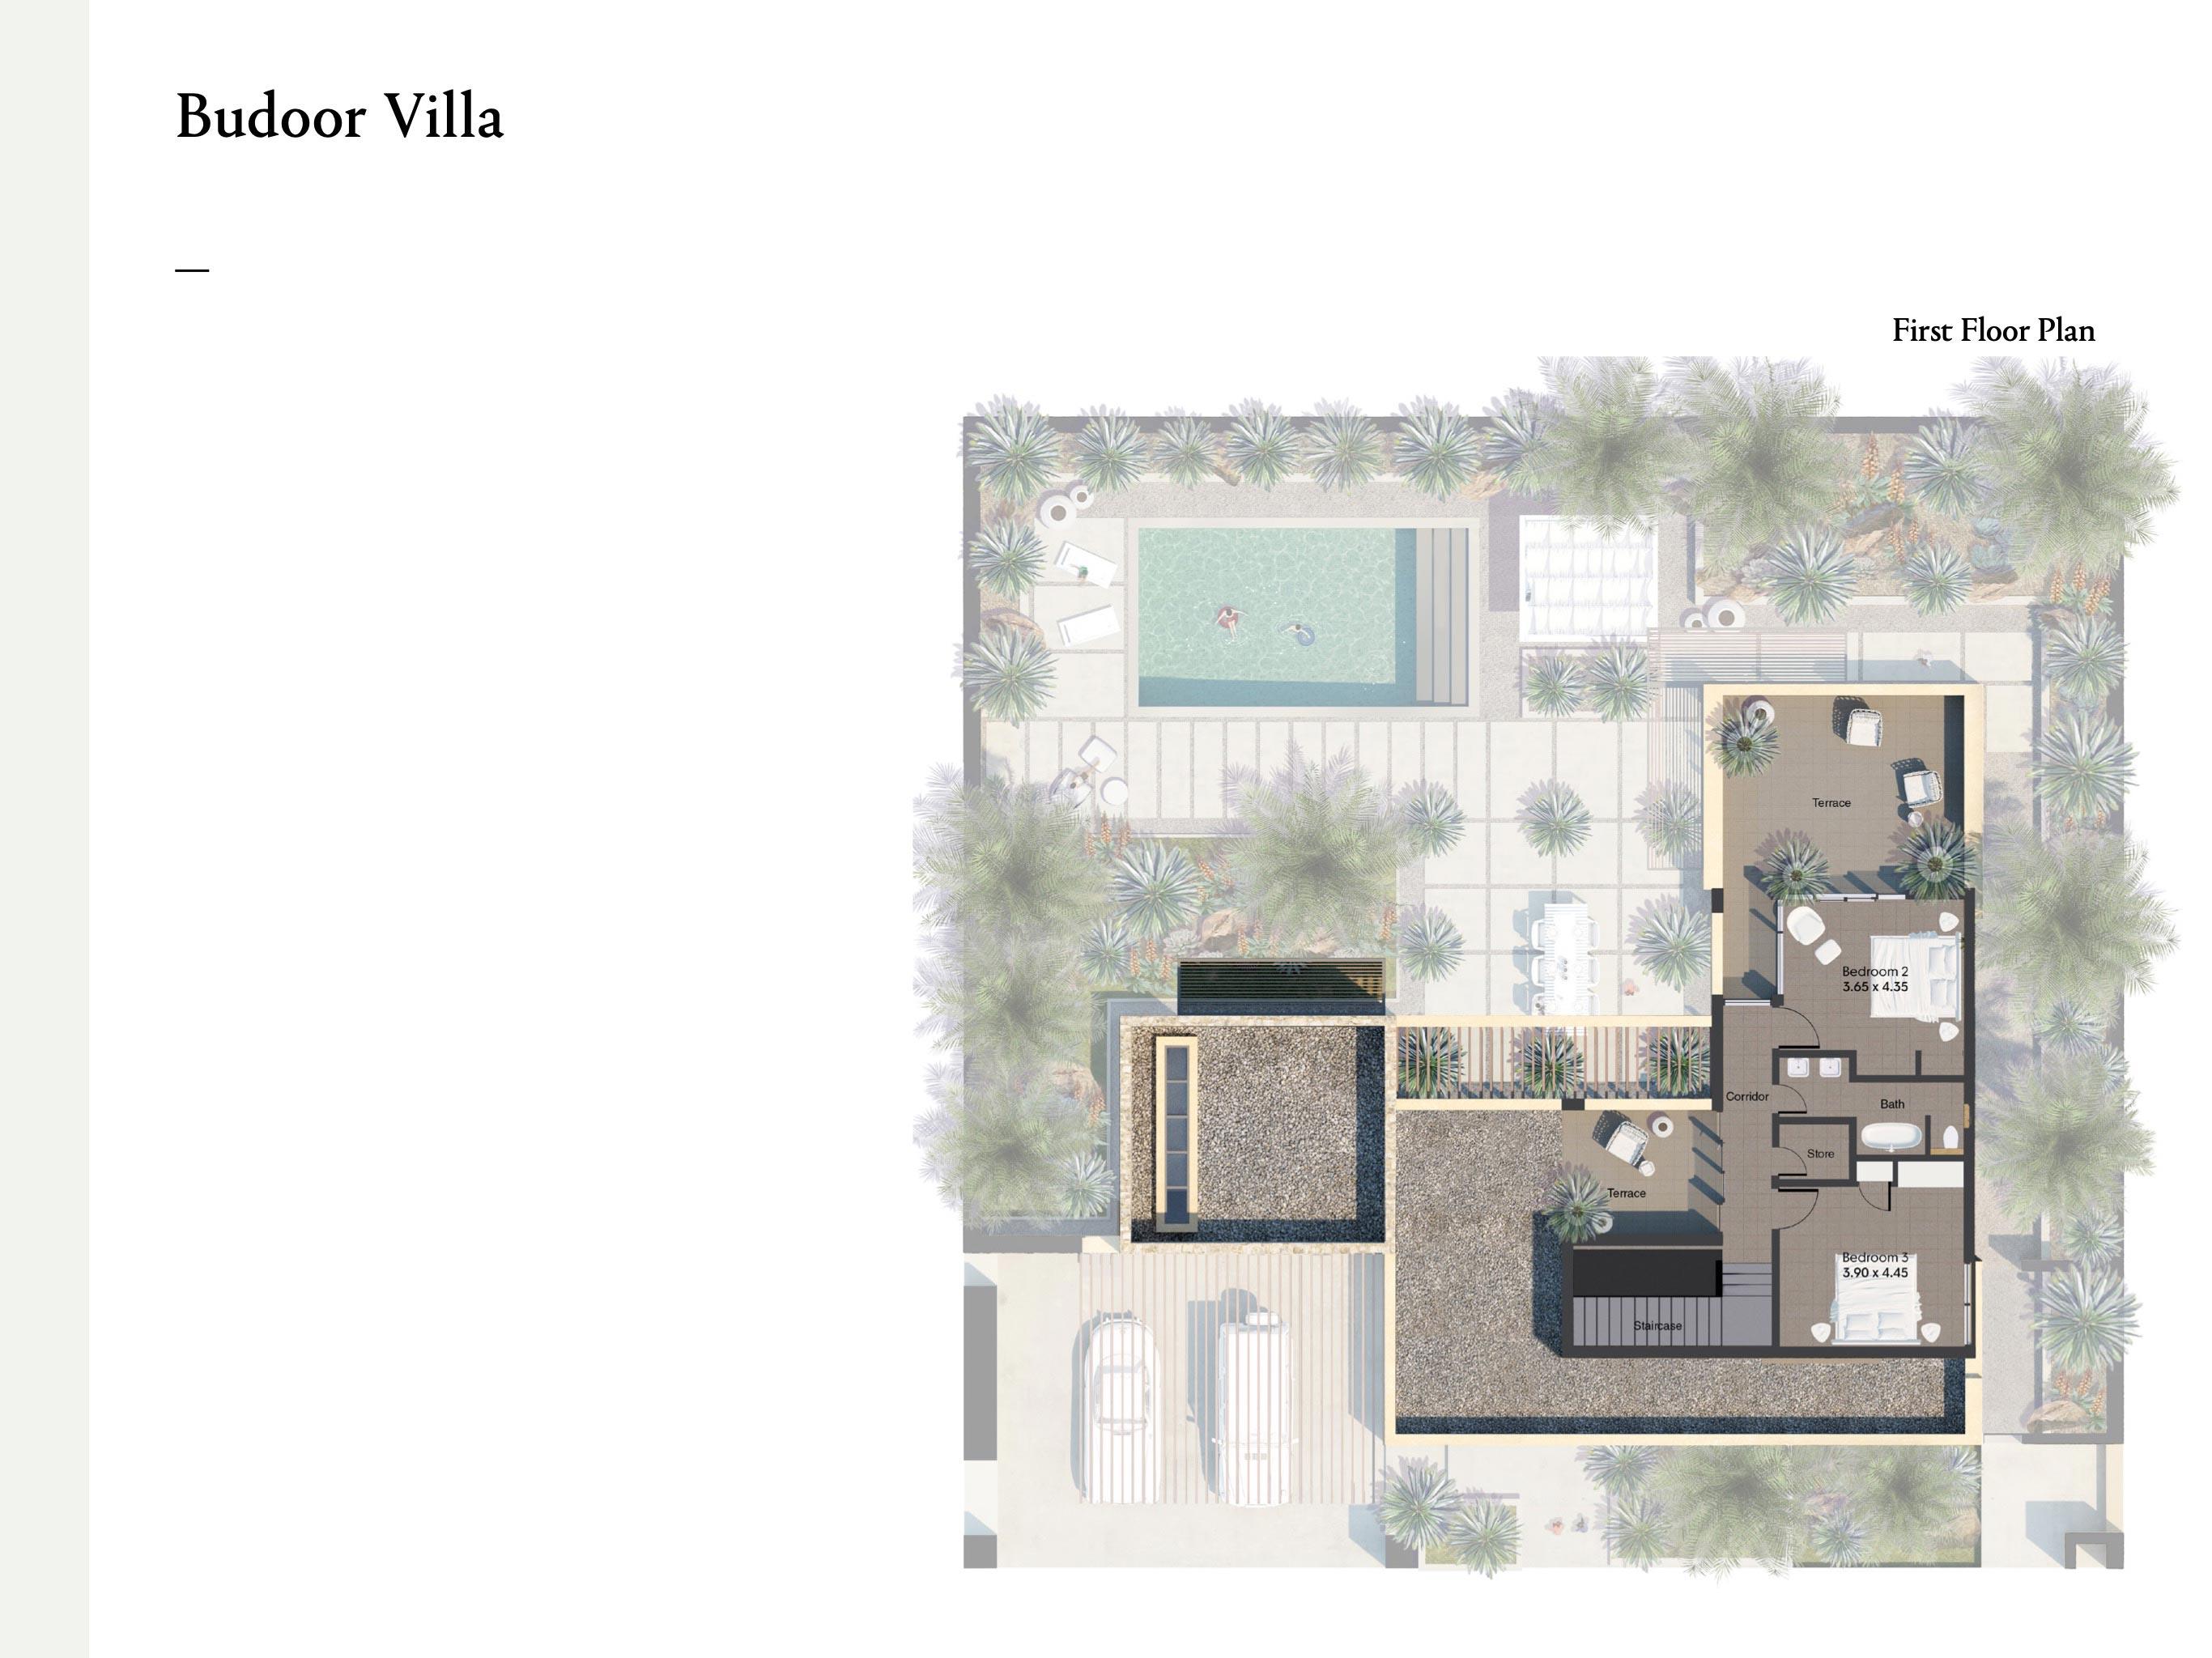 Budoor Villa - 7 Bedroom with a size area of 830 sqm